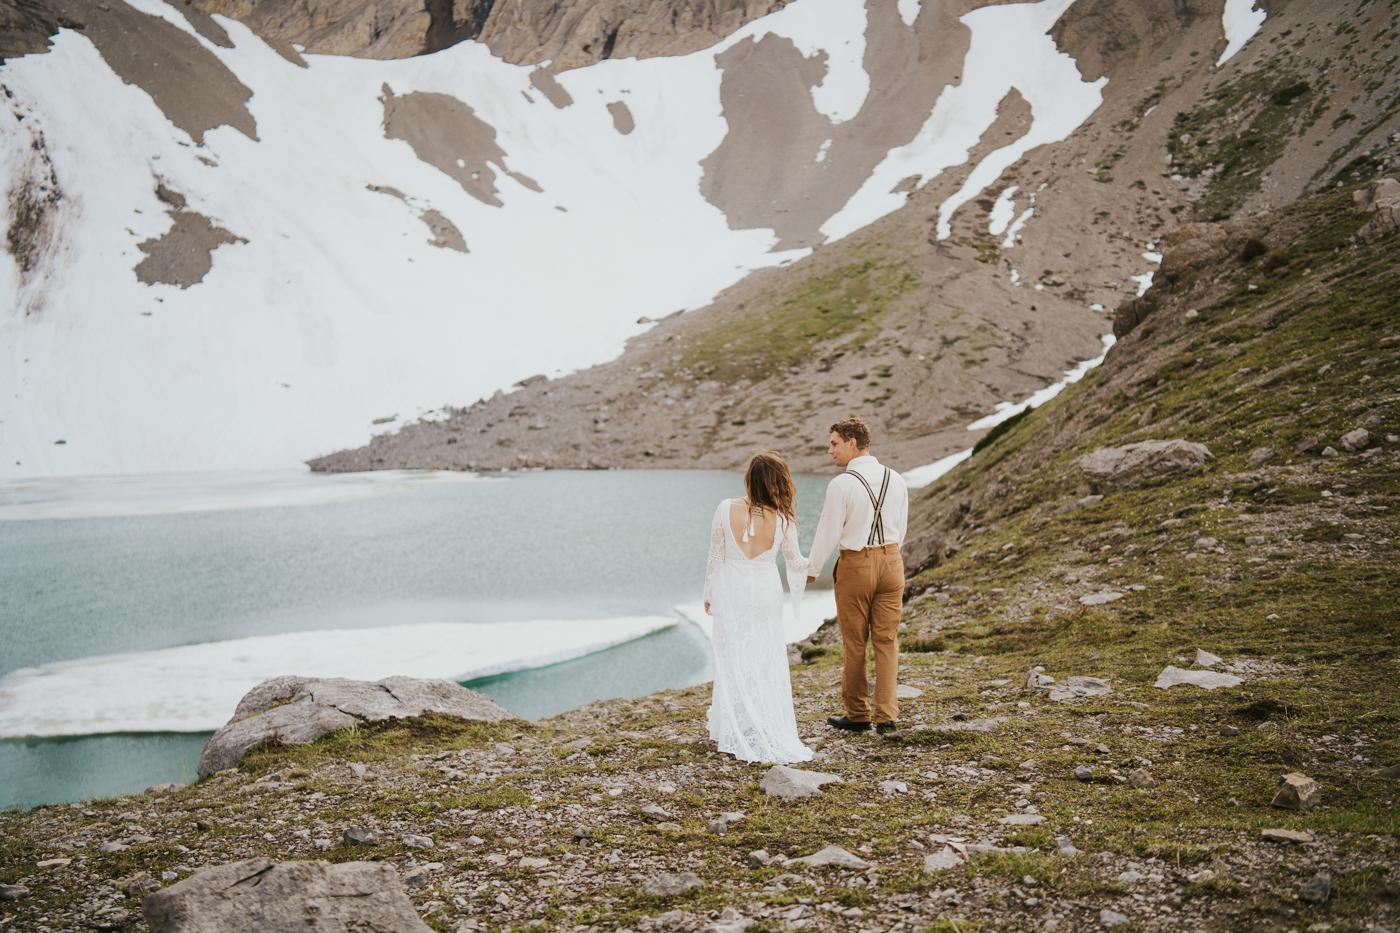 tyraephotography_photographer_wedding_elopement_engagement_photography-07556.jpg